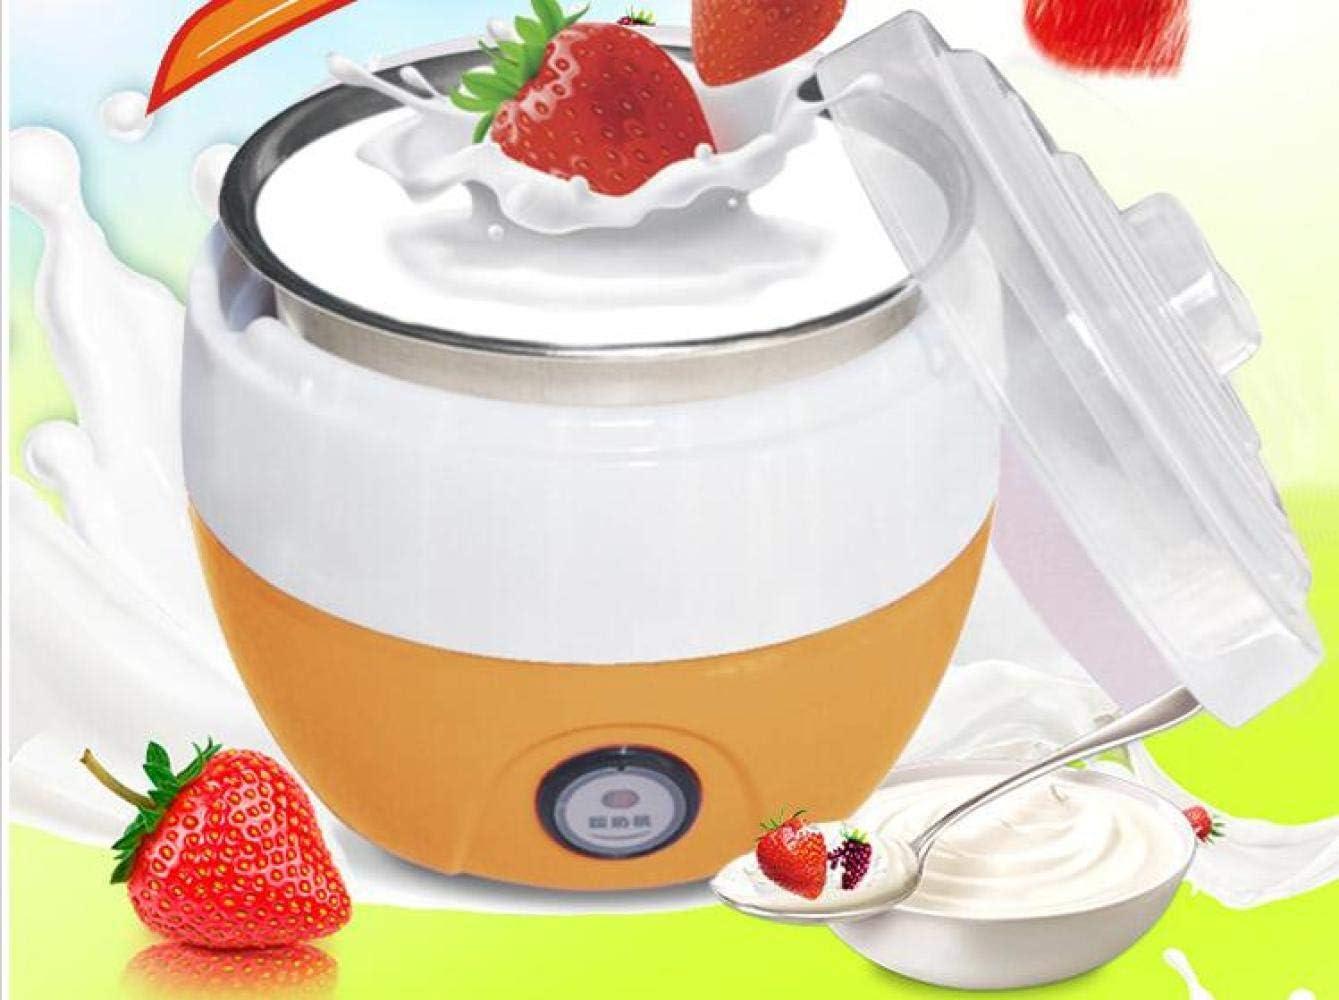 220 V Elettrico Yogurt Maker Fai Da Te Yogurt Strumento Elettrodomestici Da Cucina In Acciaio Inox Yogurt Maker Natto Macchina Ue/Au/Uk/Us Orange Pink